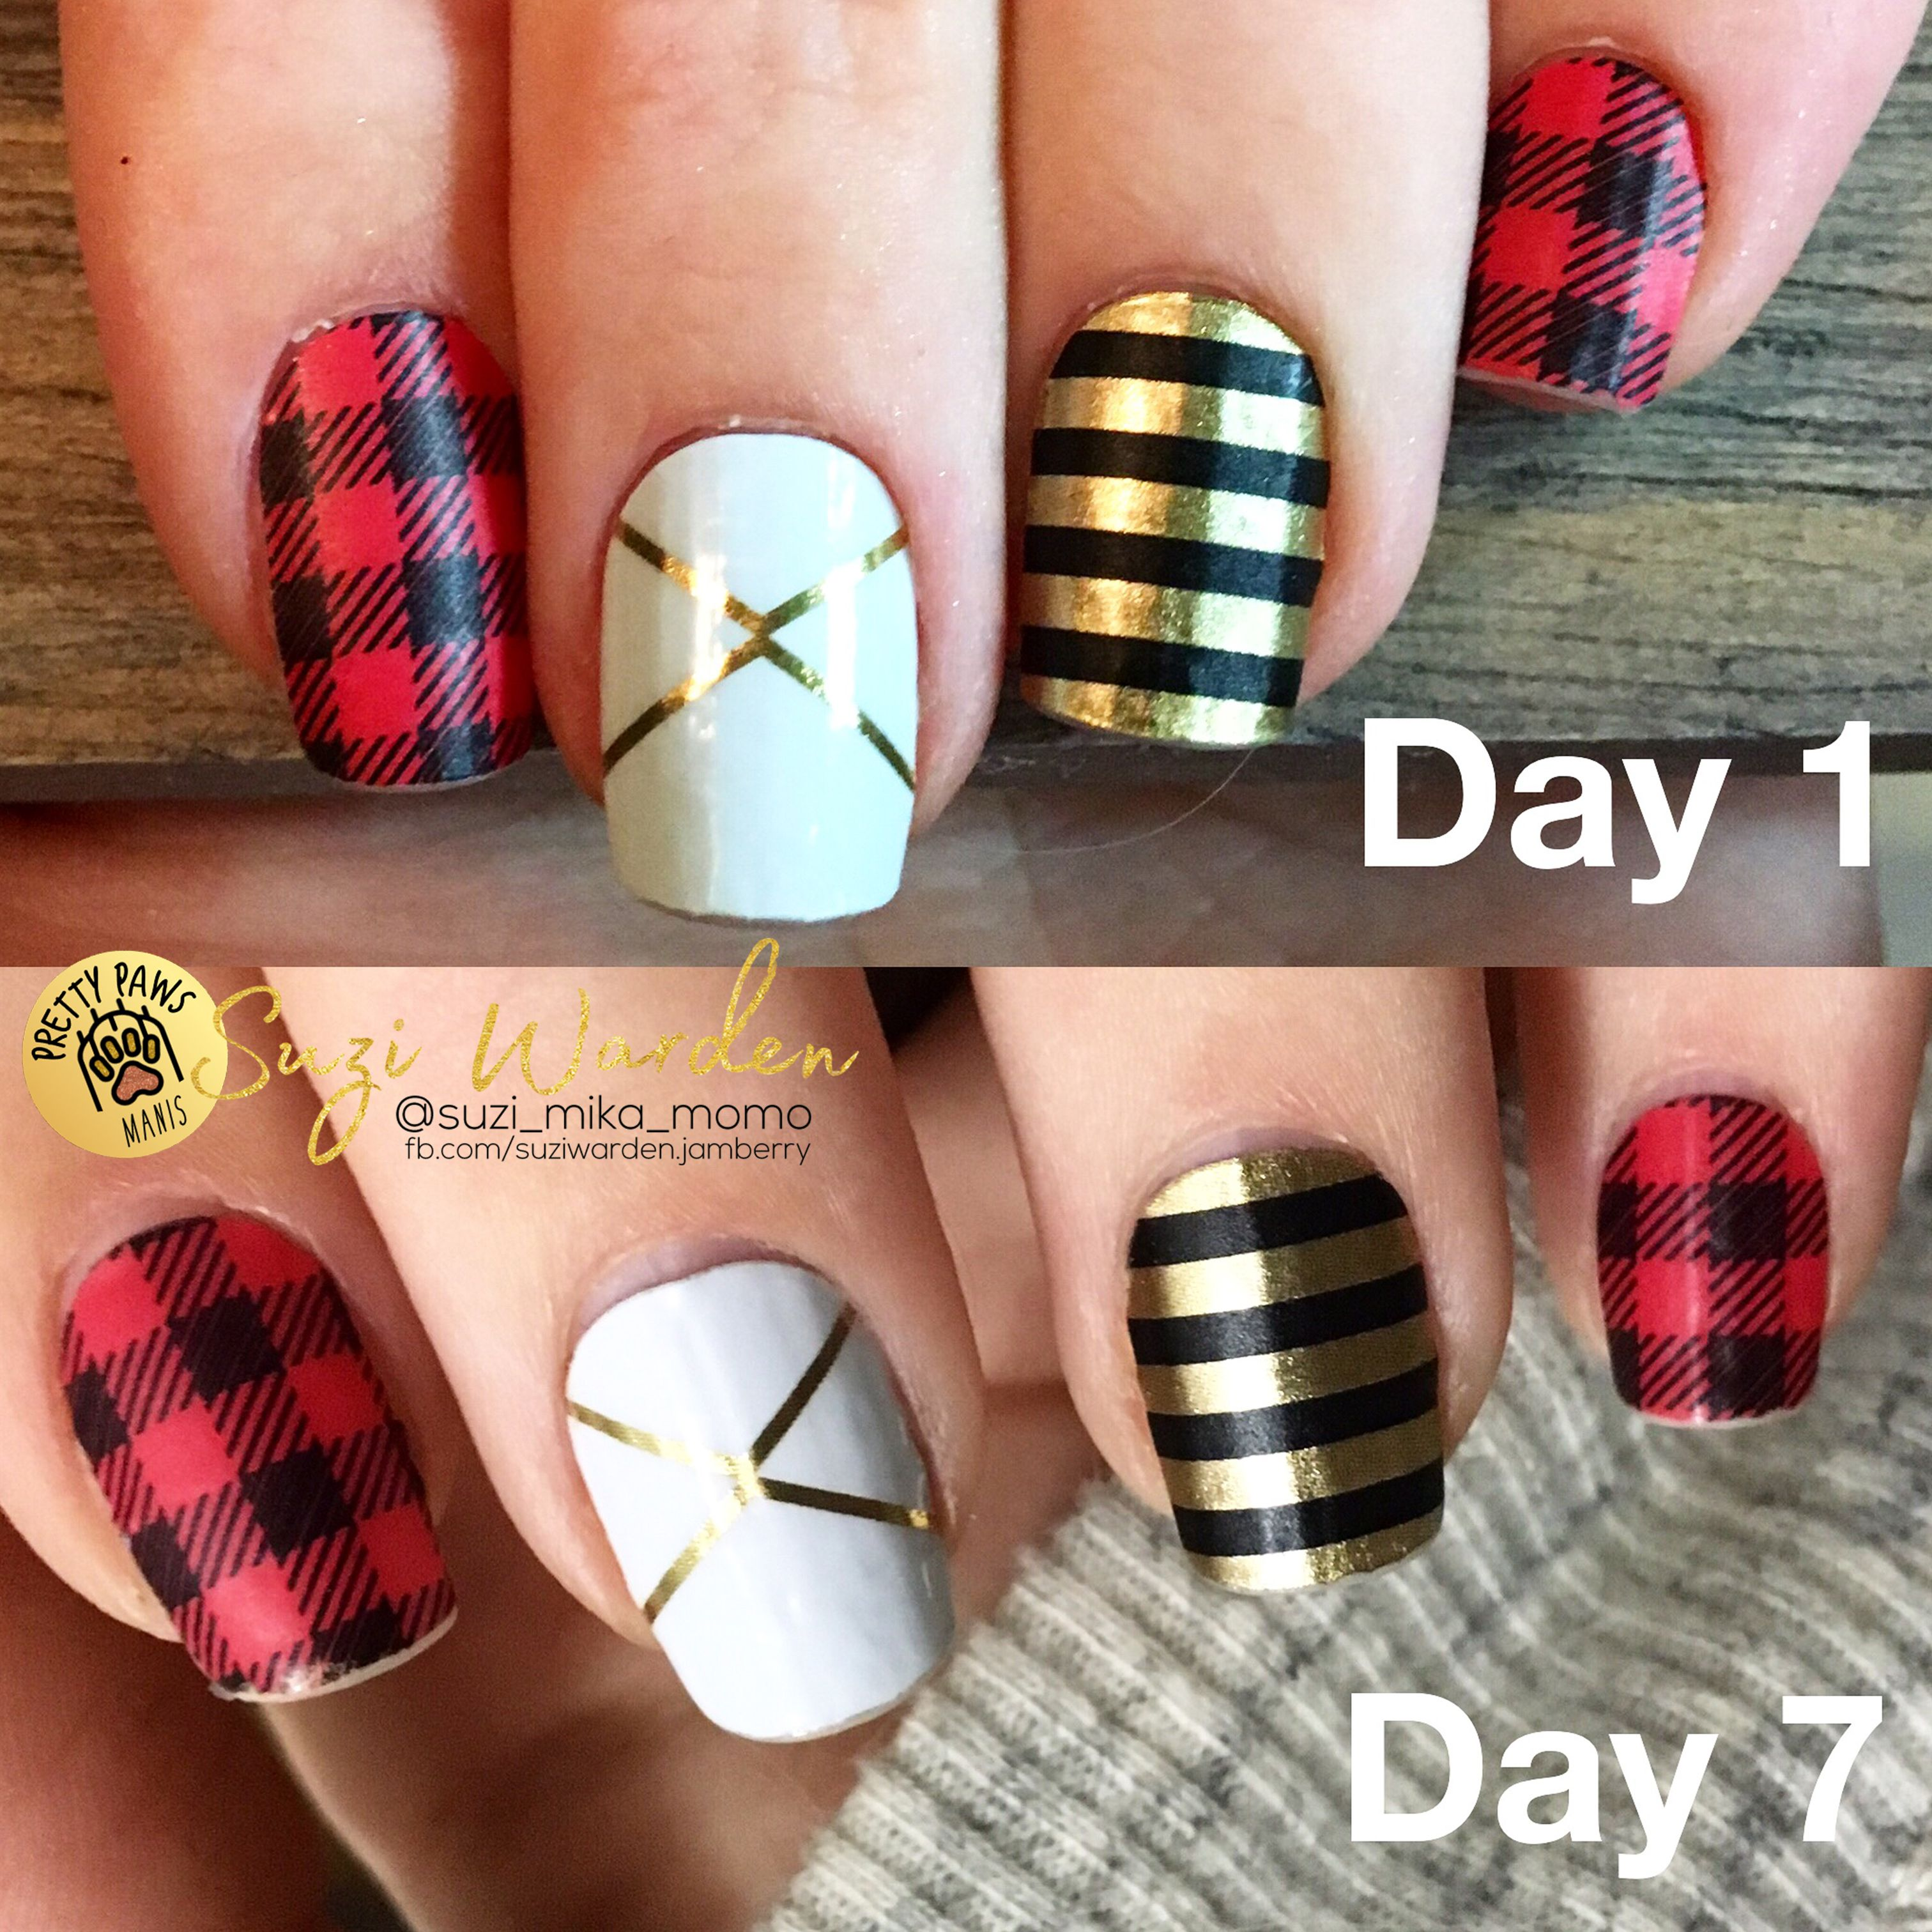 non-chip nails, even past 7 days! learn more at prettypurfect.com ...